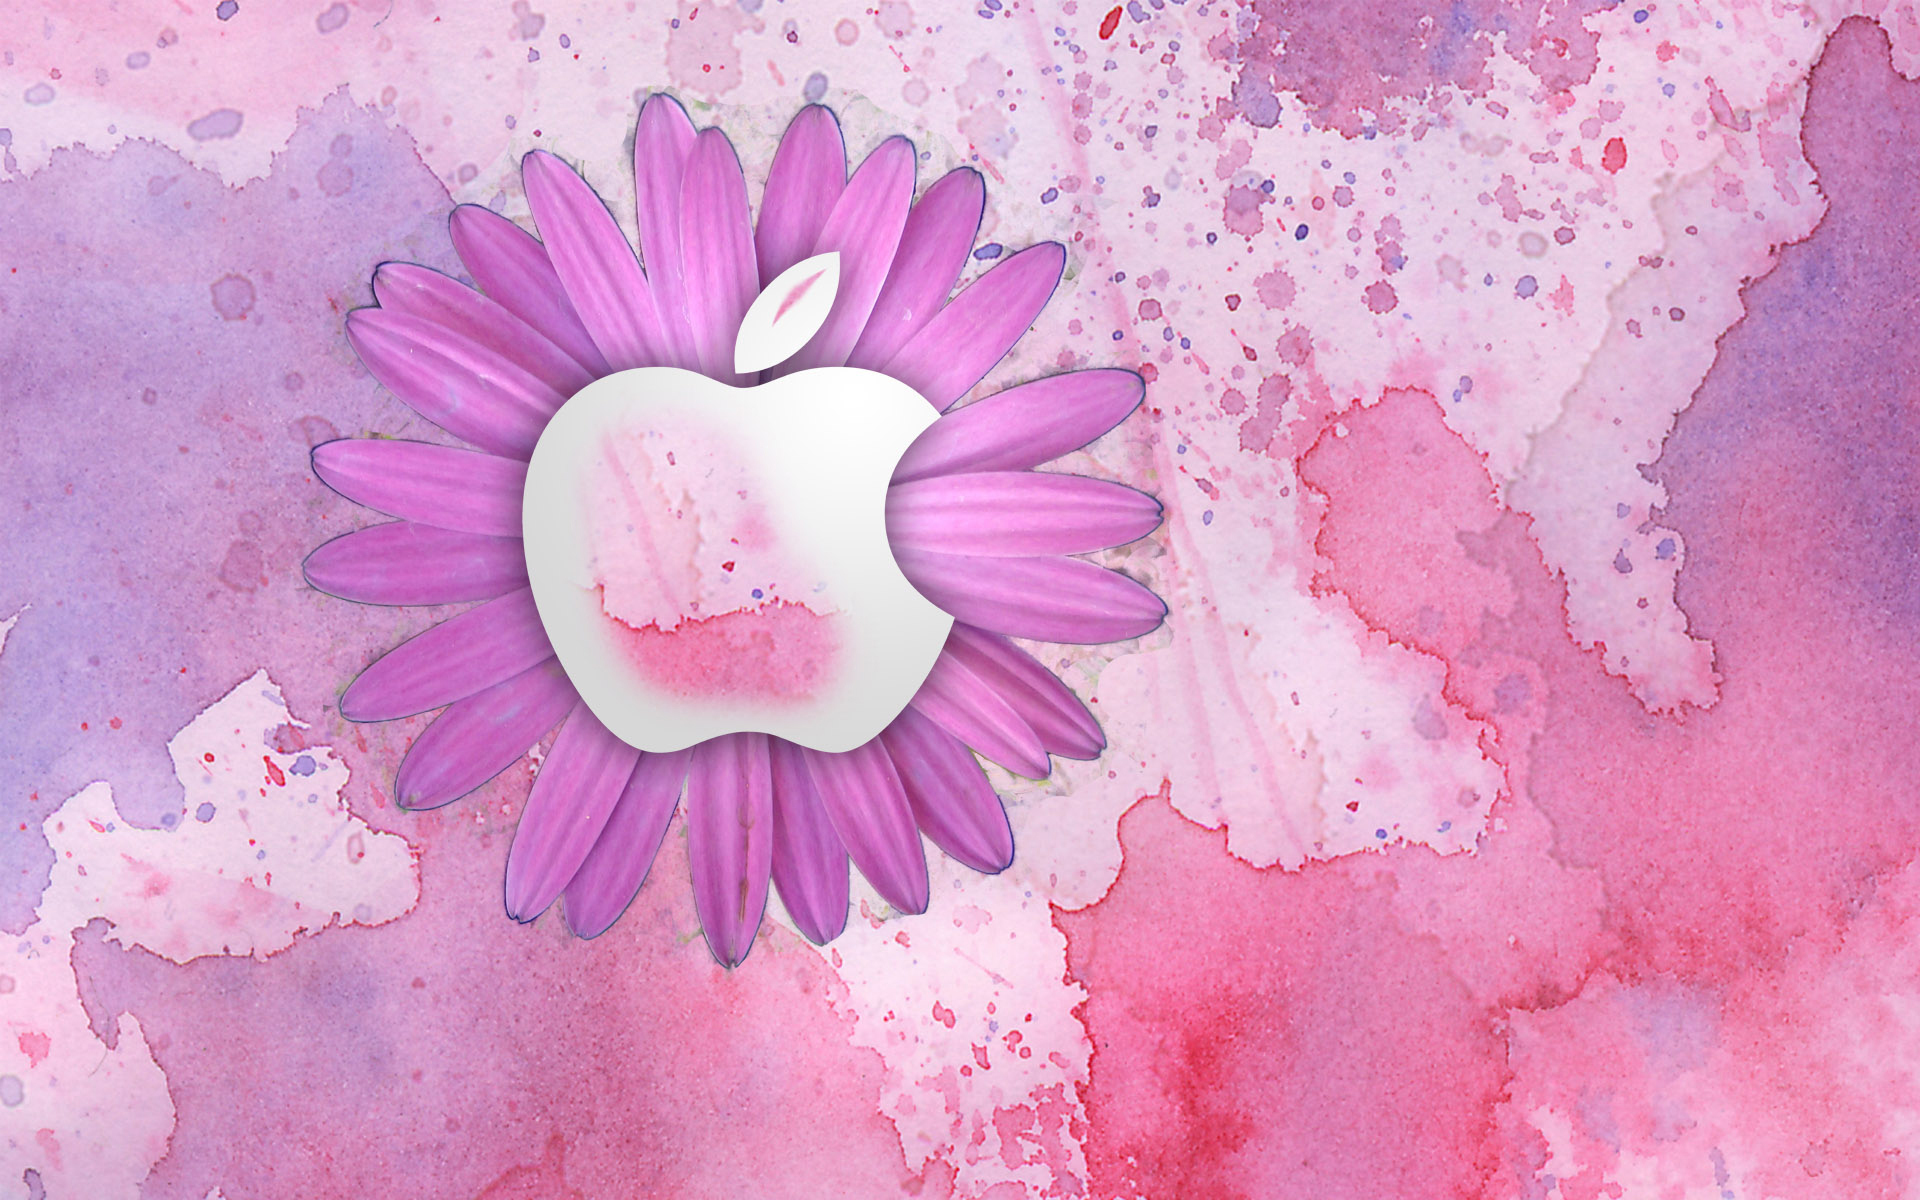 Girly Macbook Backgrounds wallpaper wallpaper hd background 1920x1200